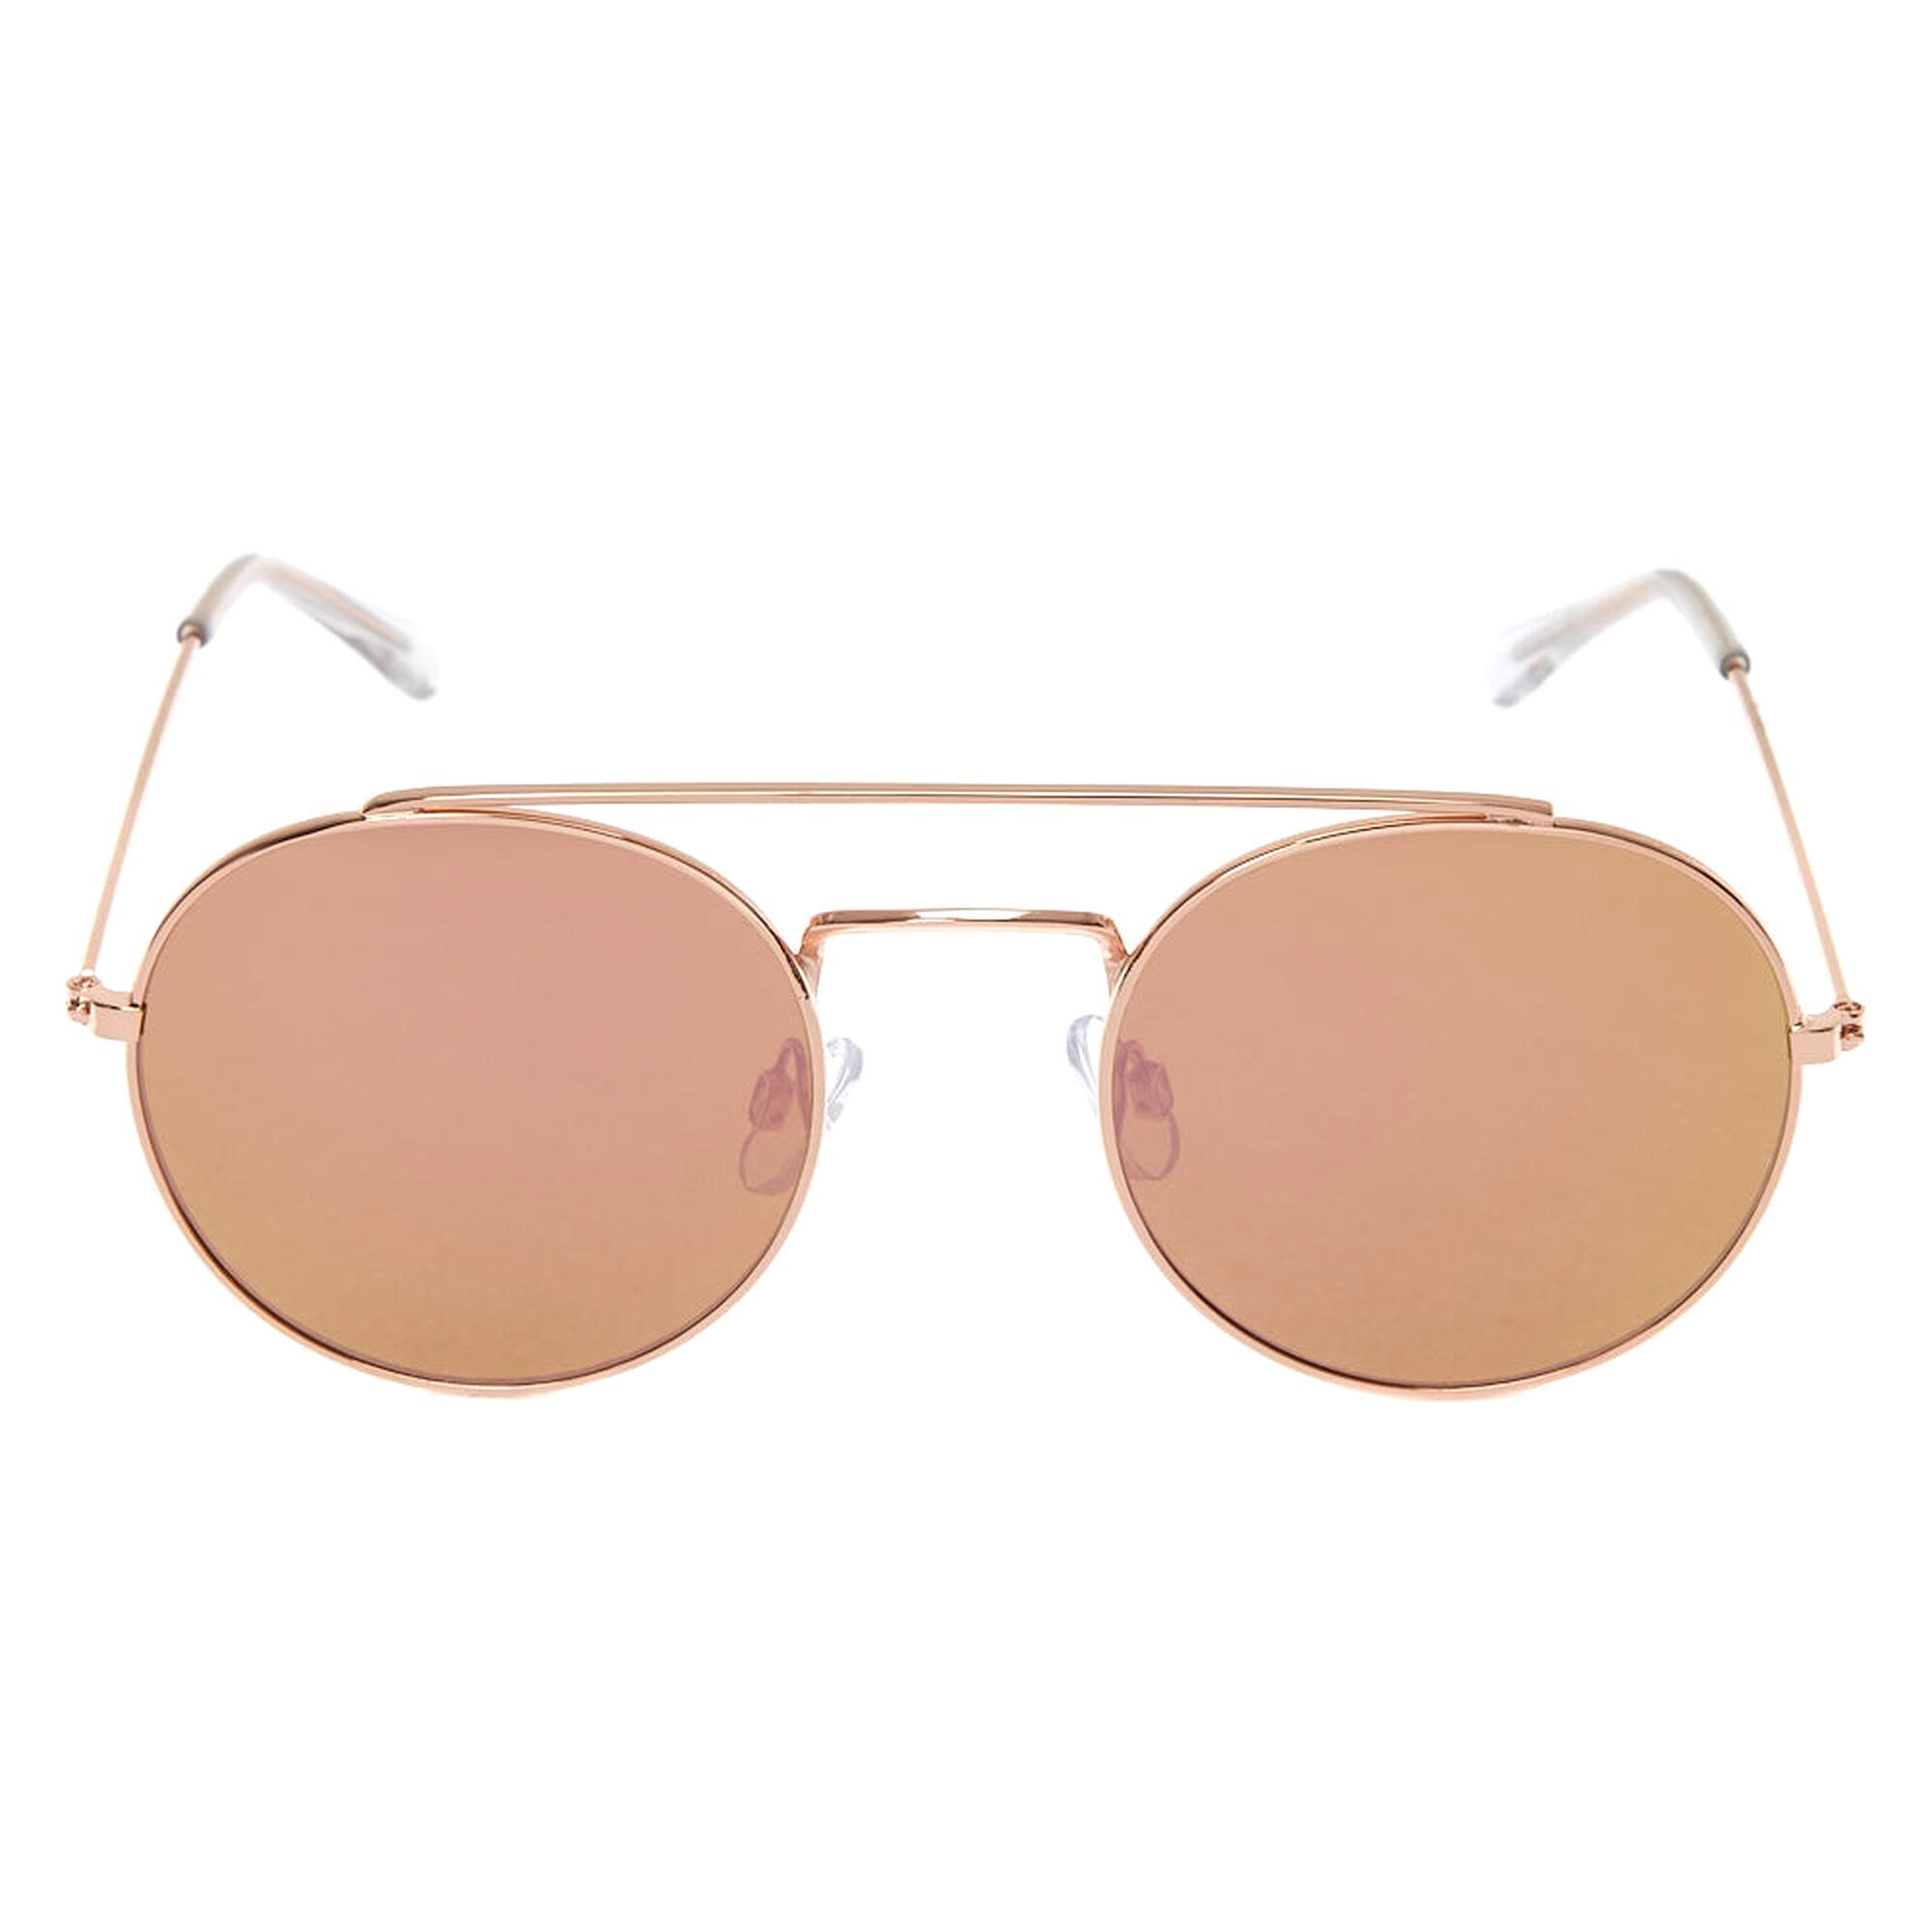 9e2bb0567d0 ... Rose Gold-Tone Round Aviator Sunglasses